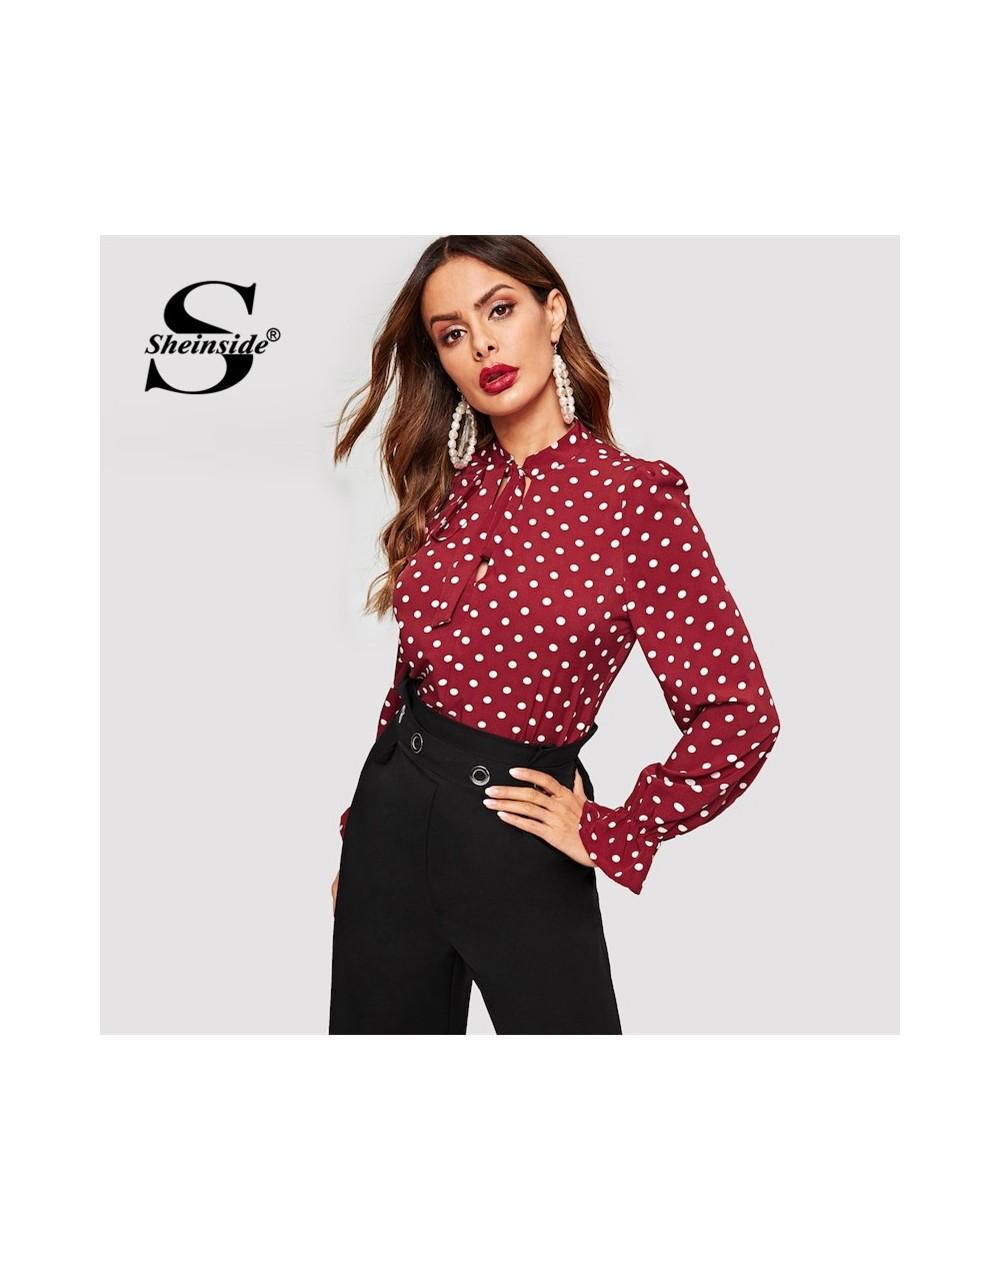 Burgundy Vintage Polka Dot Print Office Blouse Women Elegant Flounce Sleeve Blouses Spring Casual Stand Collar Tops - 413073...